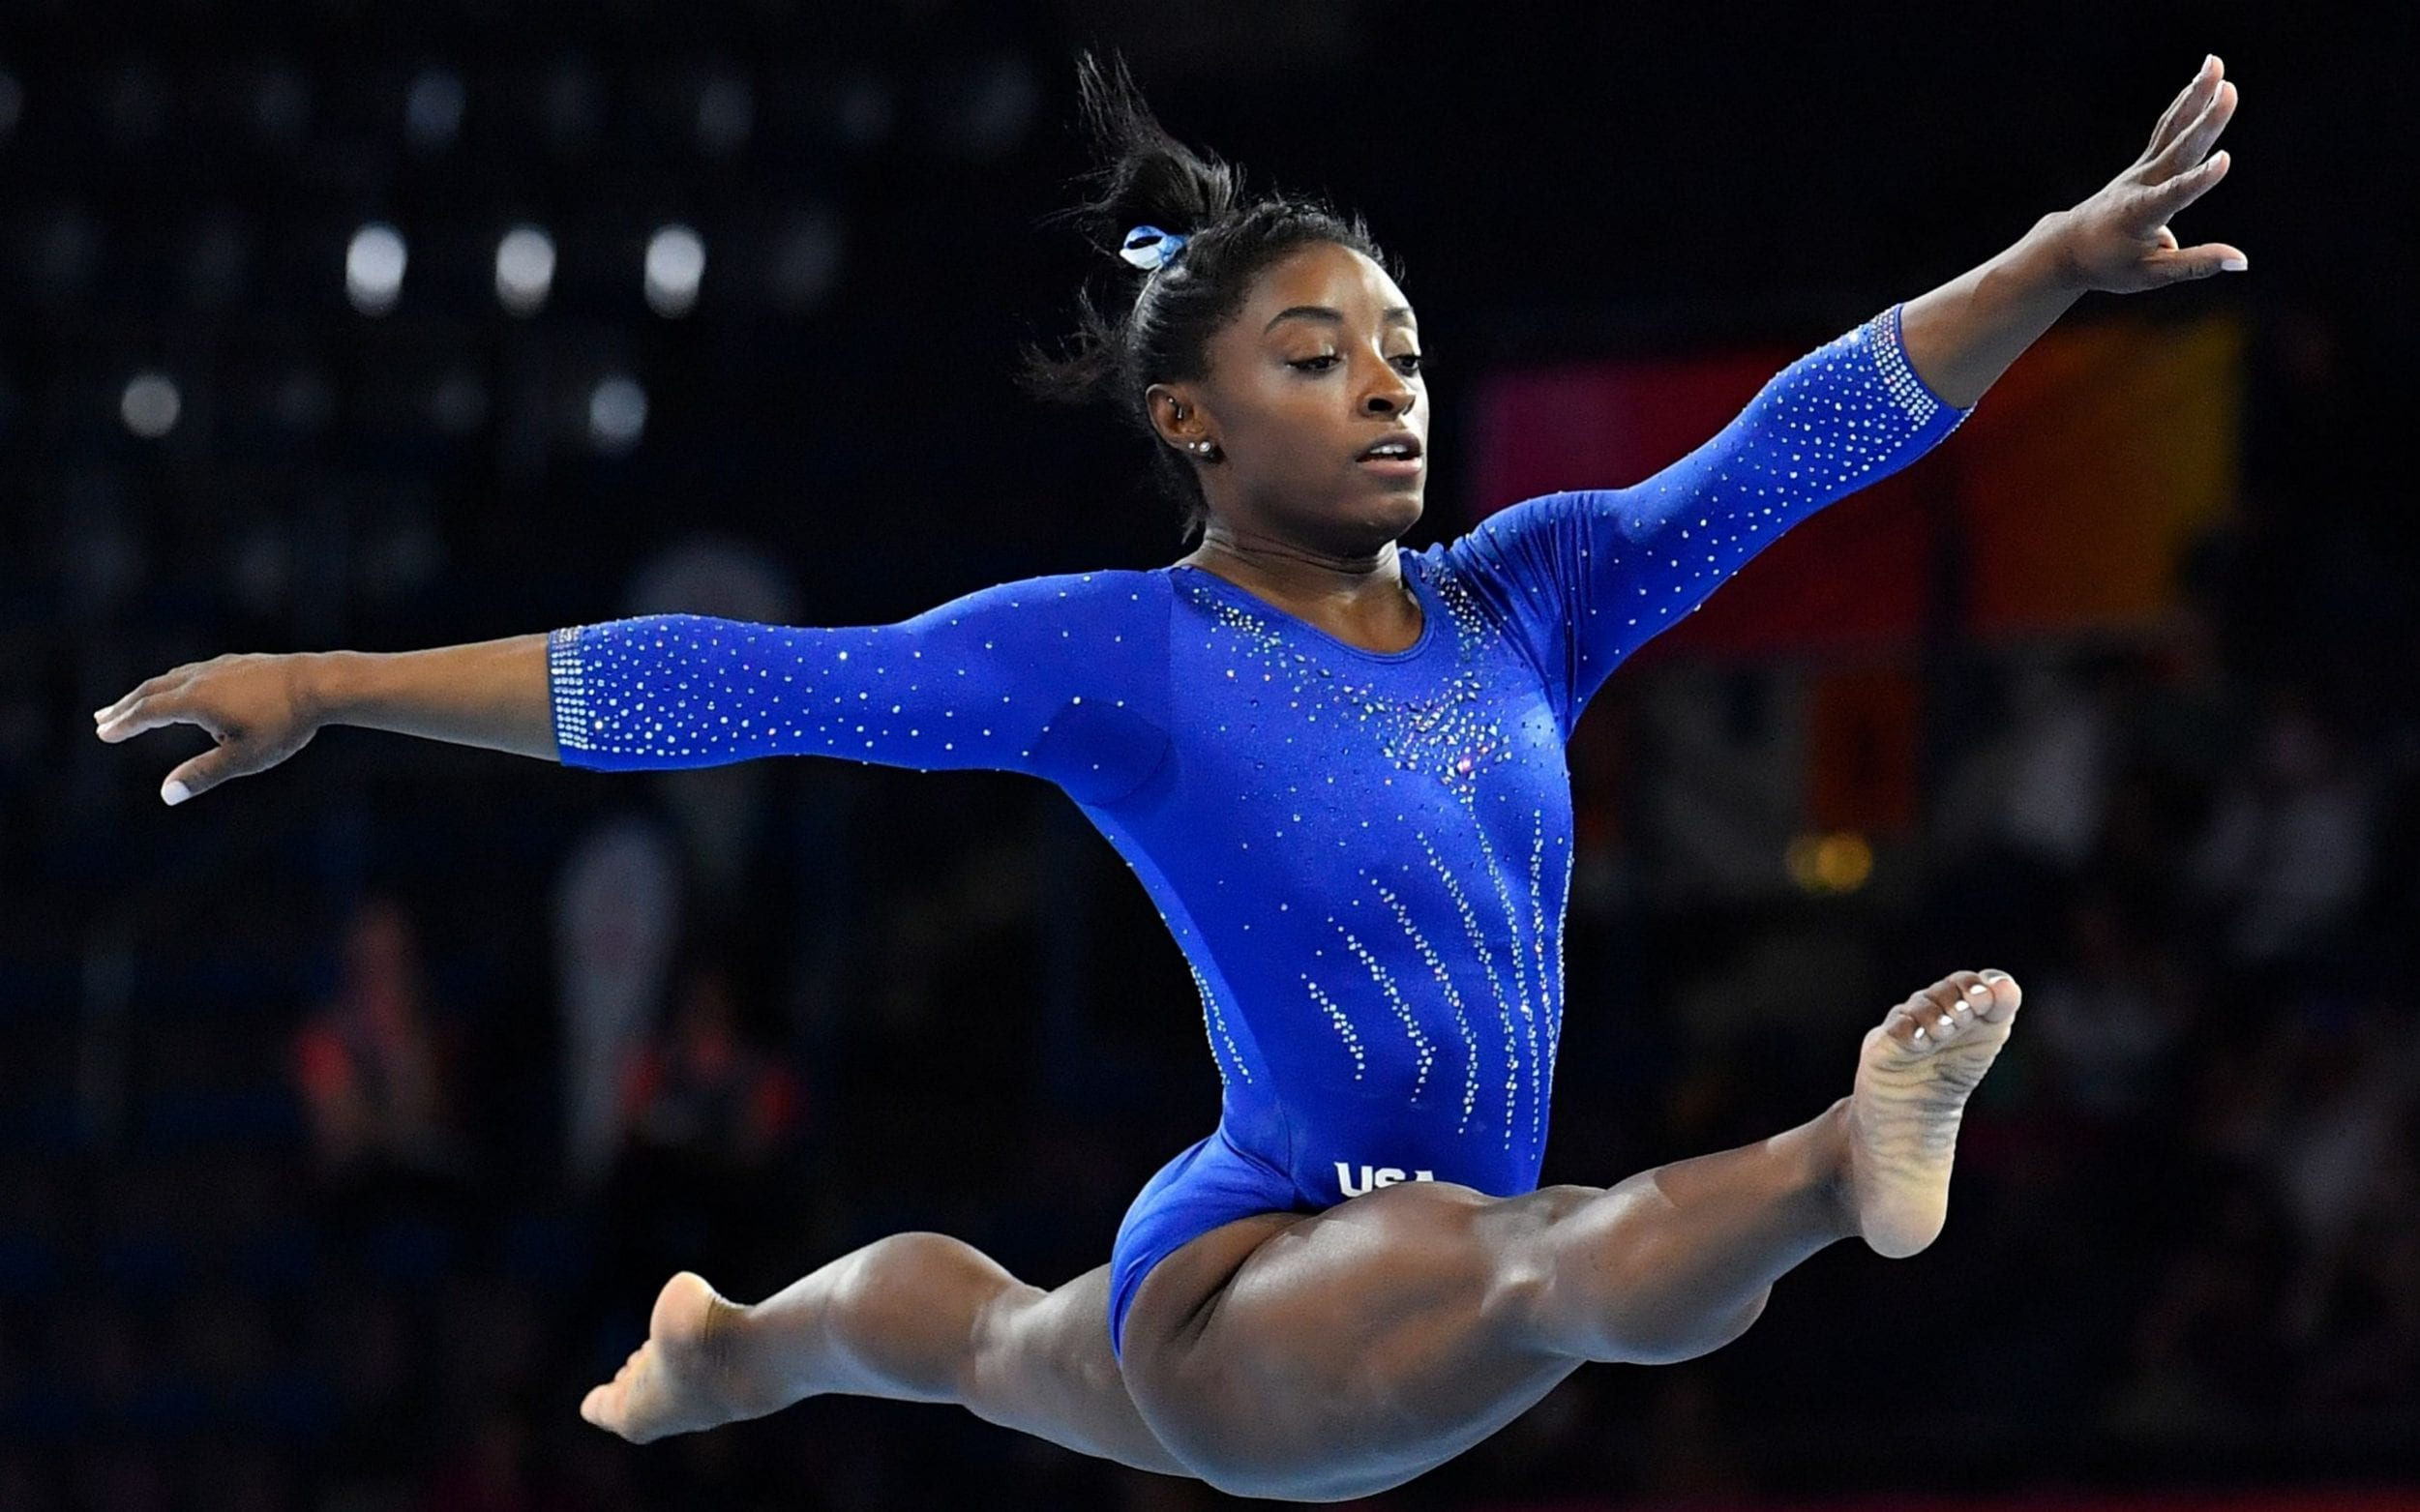 Simone Biles: Facebook Watch sviluppa una docuserie sulla ginnasta